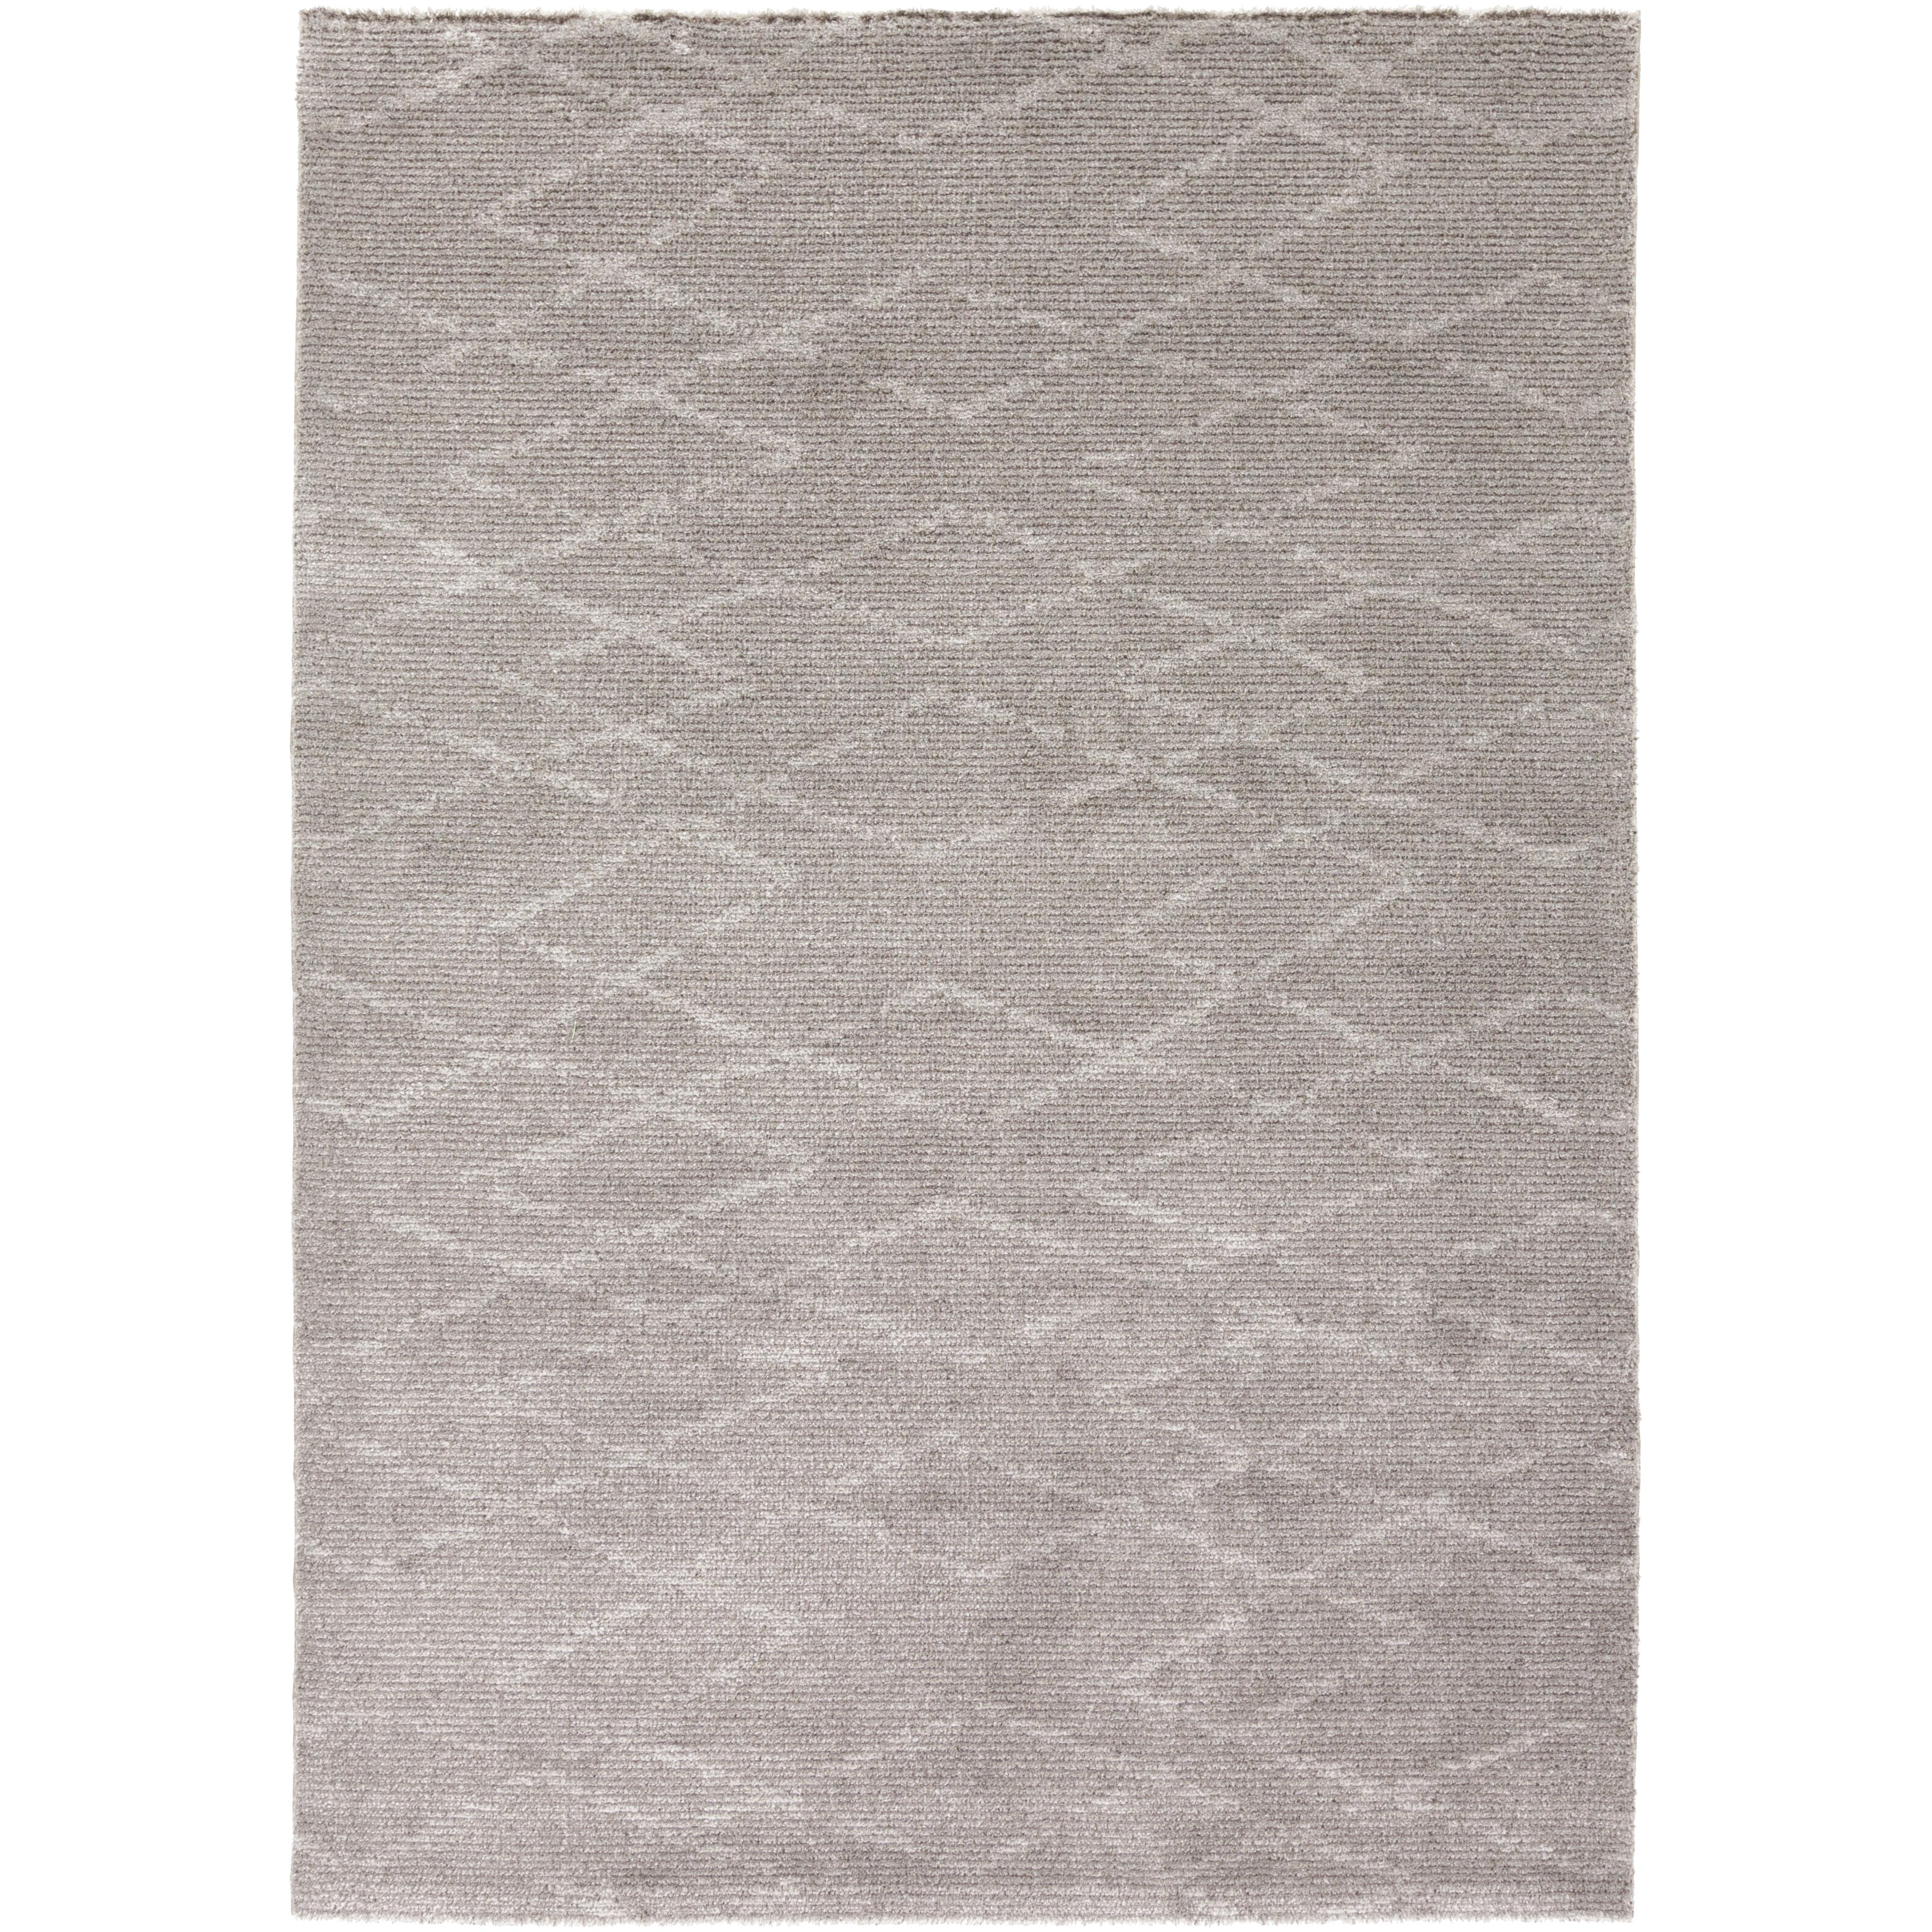 Surya Rugs Perla 5' x 8' - Item Number: PRA6000-58